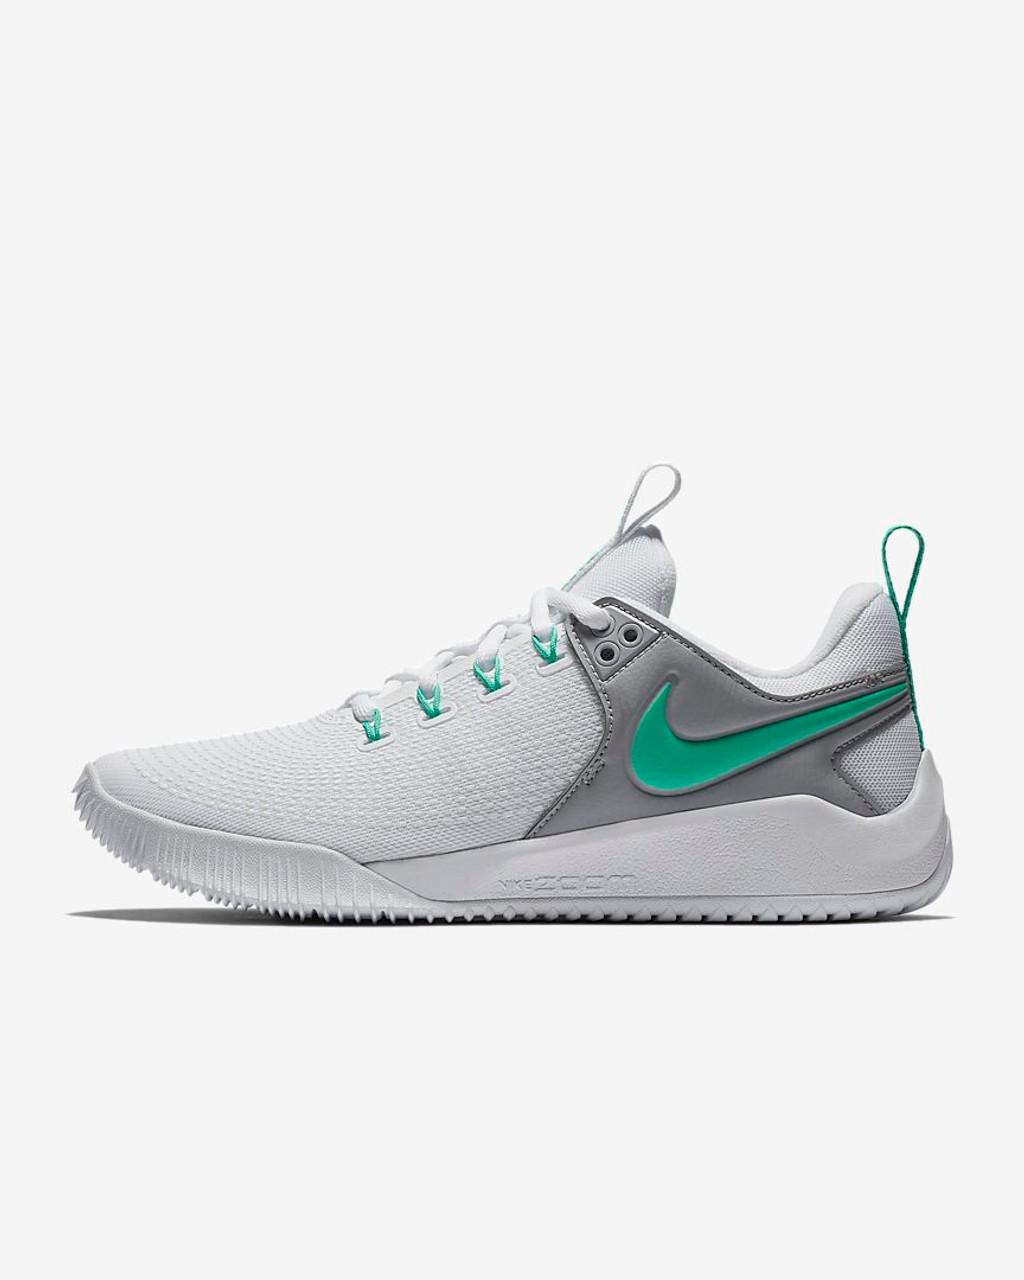 51baf9e6a52712 Nike Women s Zoom HyperAce 2 Volleyball Shoe - White Wolf Grey ...